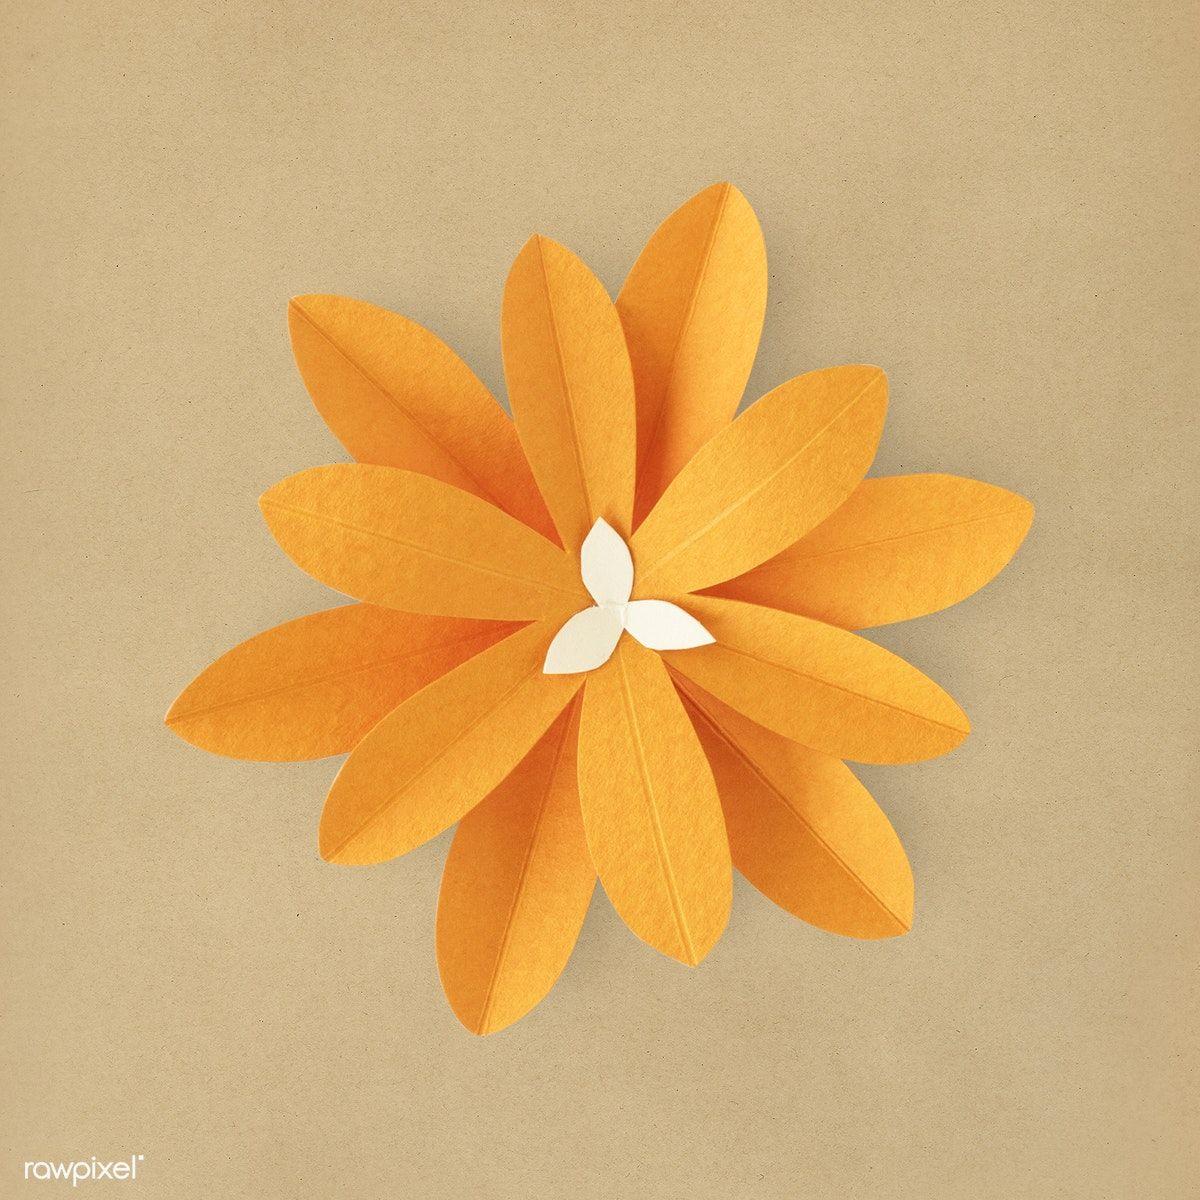 Orang flower paper craft premium image by rawpixel